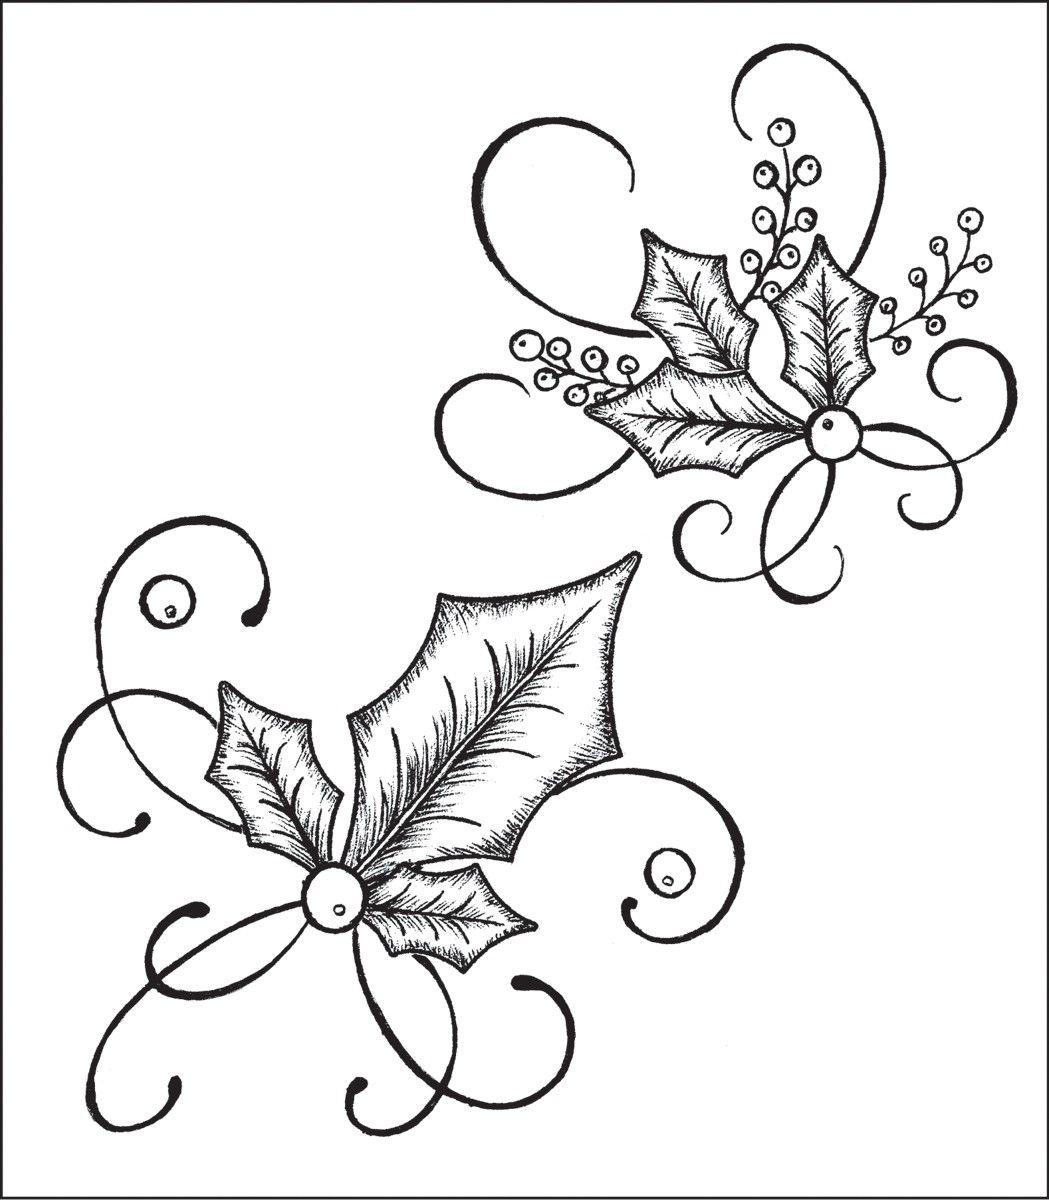 Heartfelt Creations 'Elegant Holly Swirls' Cling Rubber Stamp Set